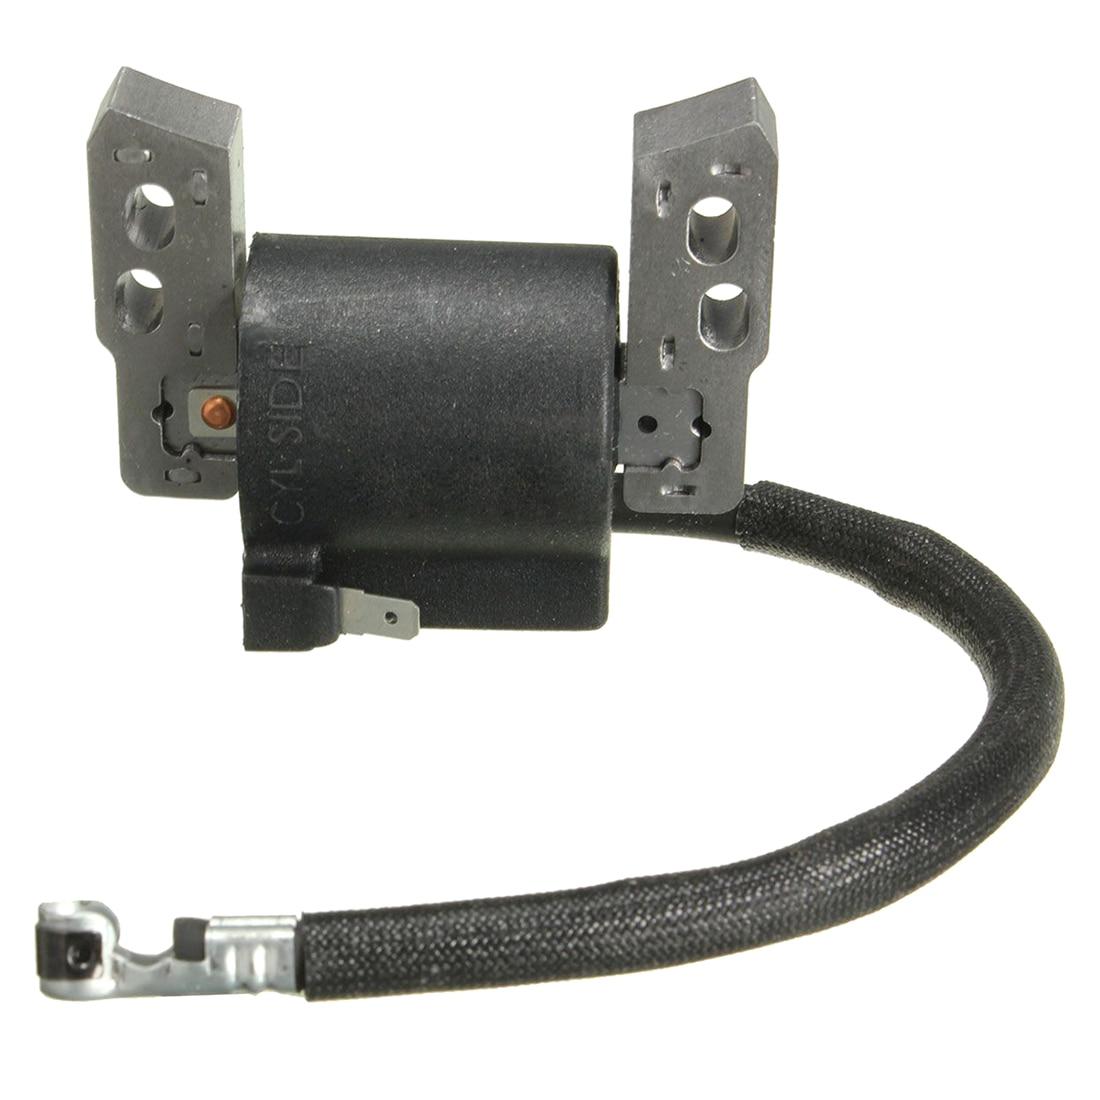 AUTO Lawn Electronic Ignition Coil For Briggs & Stratton 695711 802574 796964 Black